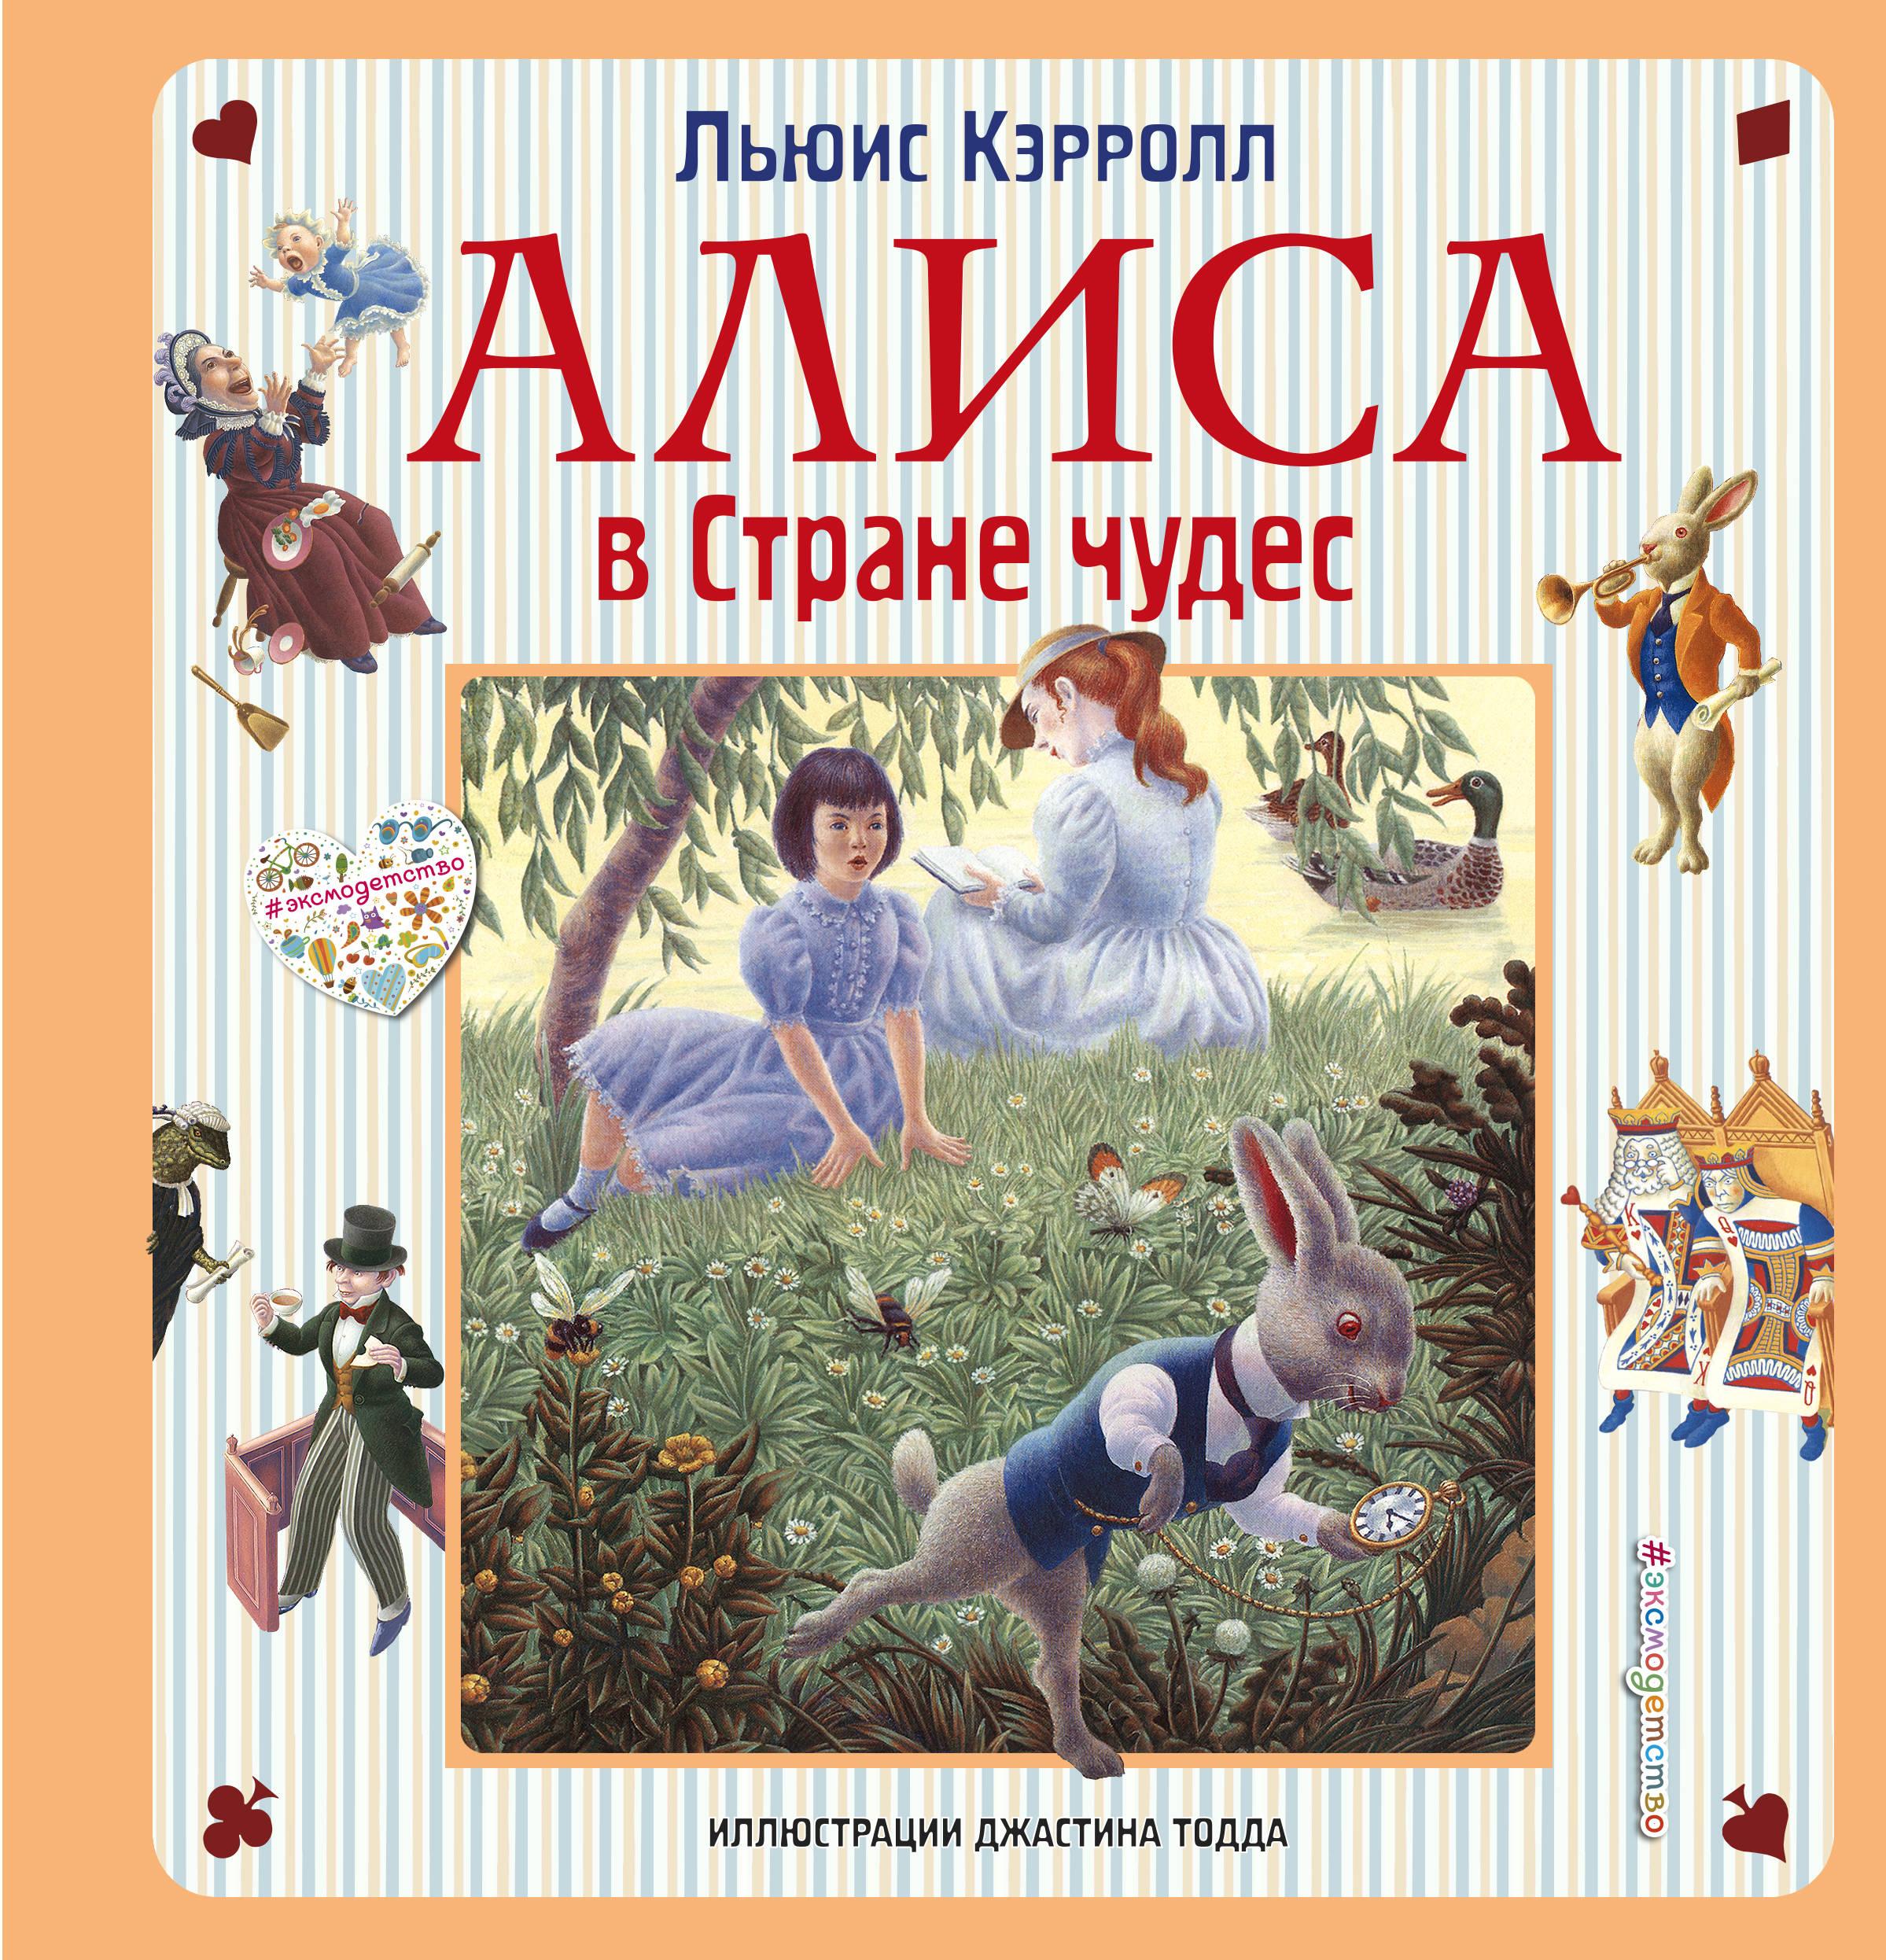 Алиса в Стране чудес. Алиса в Зазеркалье (ил. Дж. Тодда)